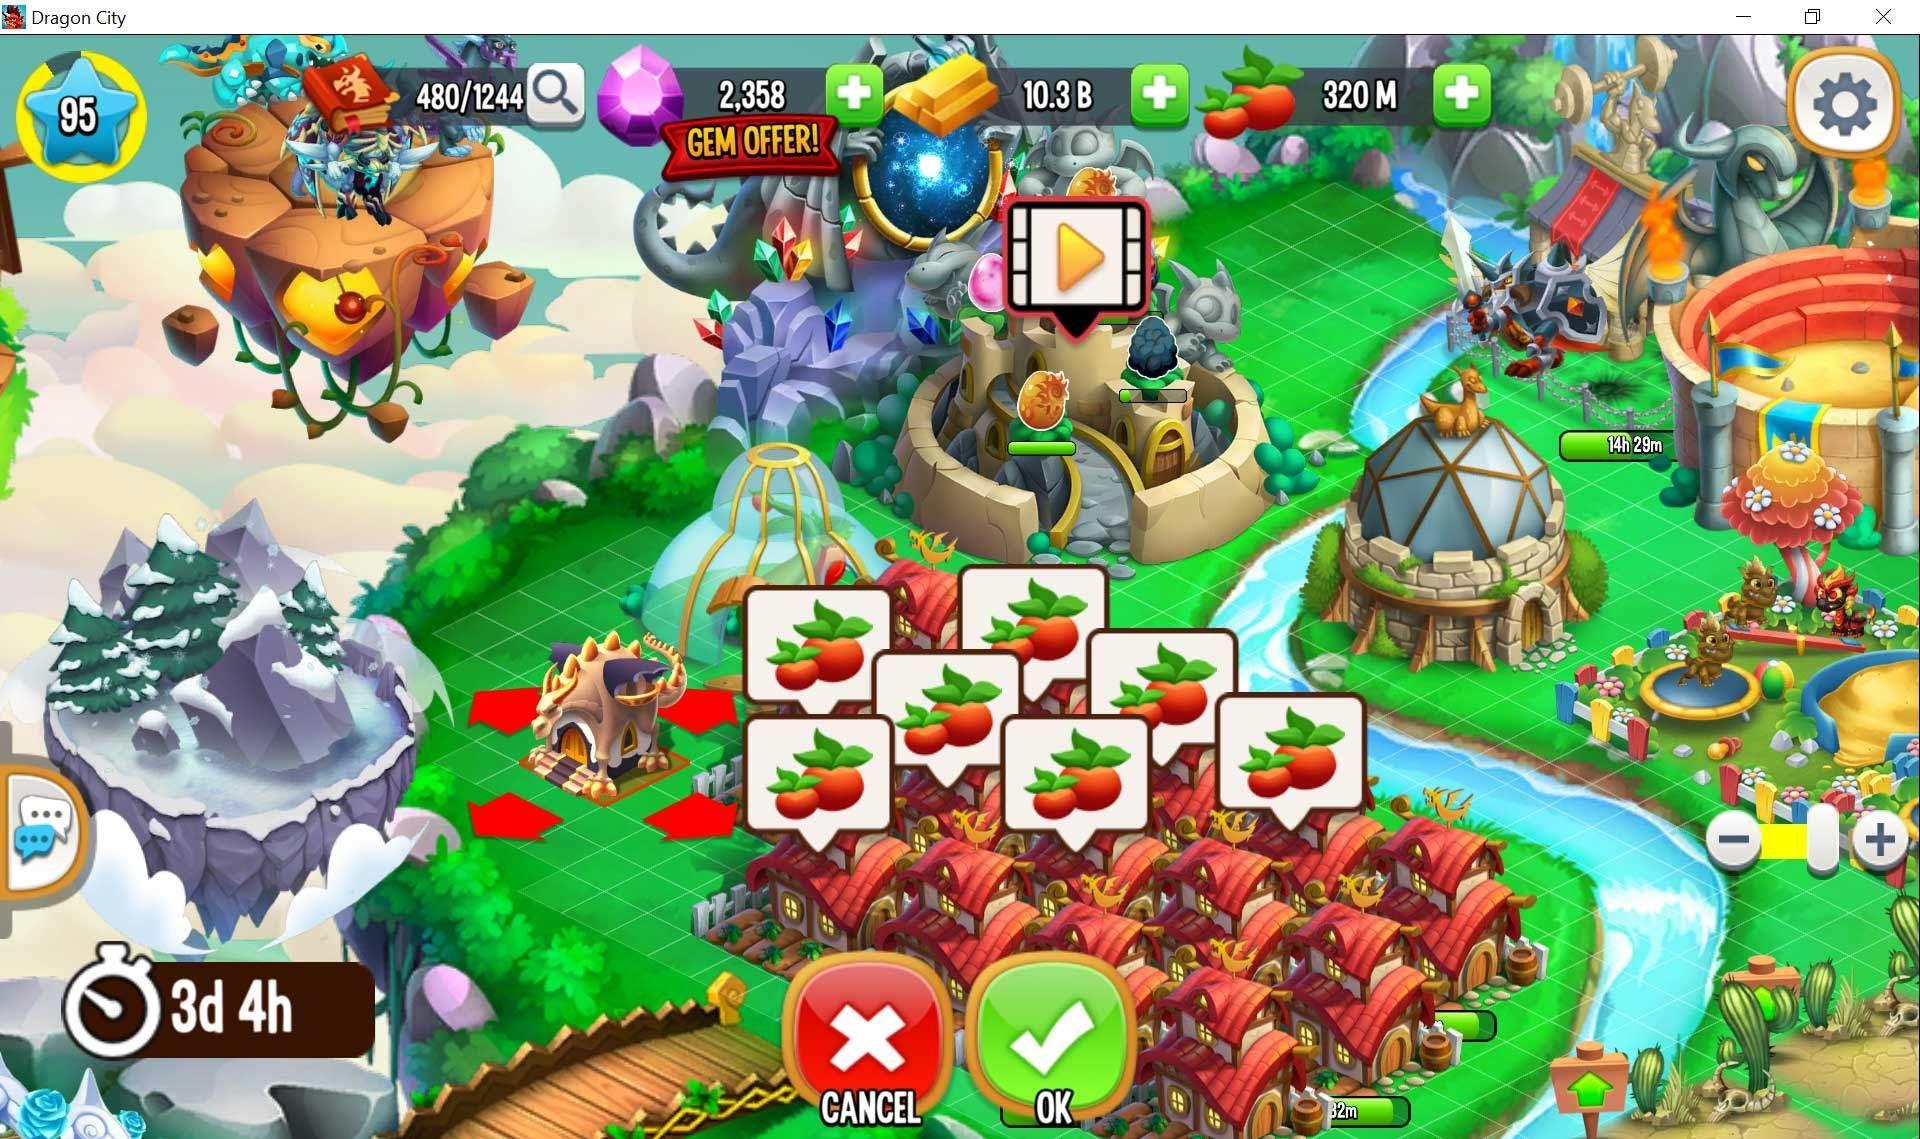 0_1580107957708_screenshot-lush-island.jpg